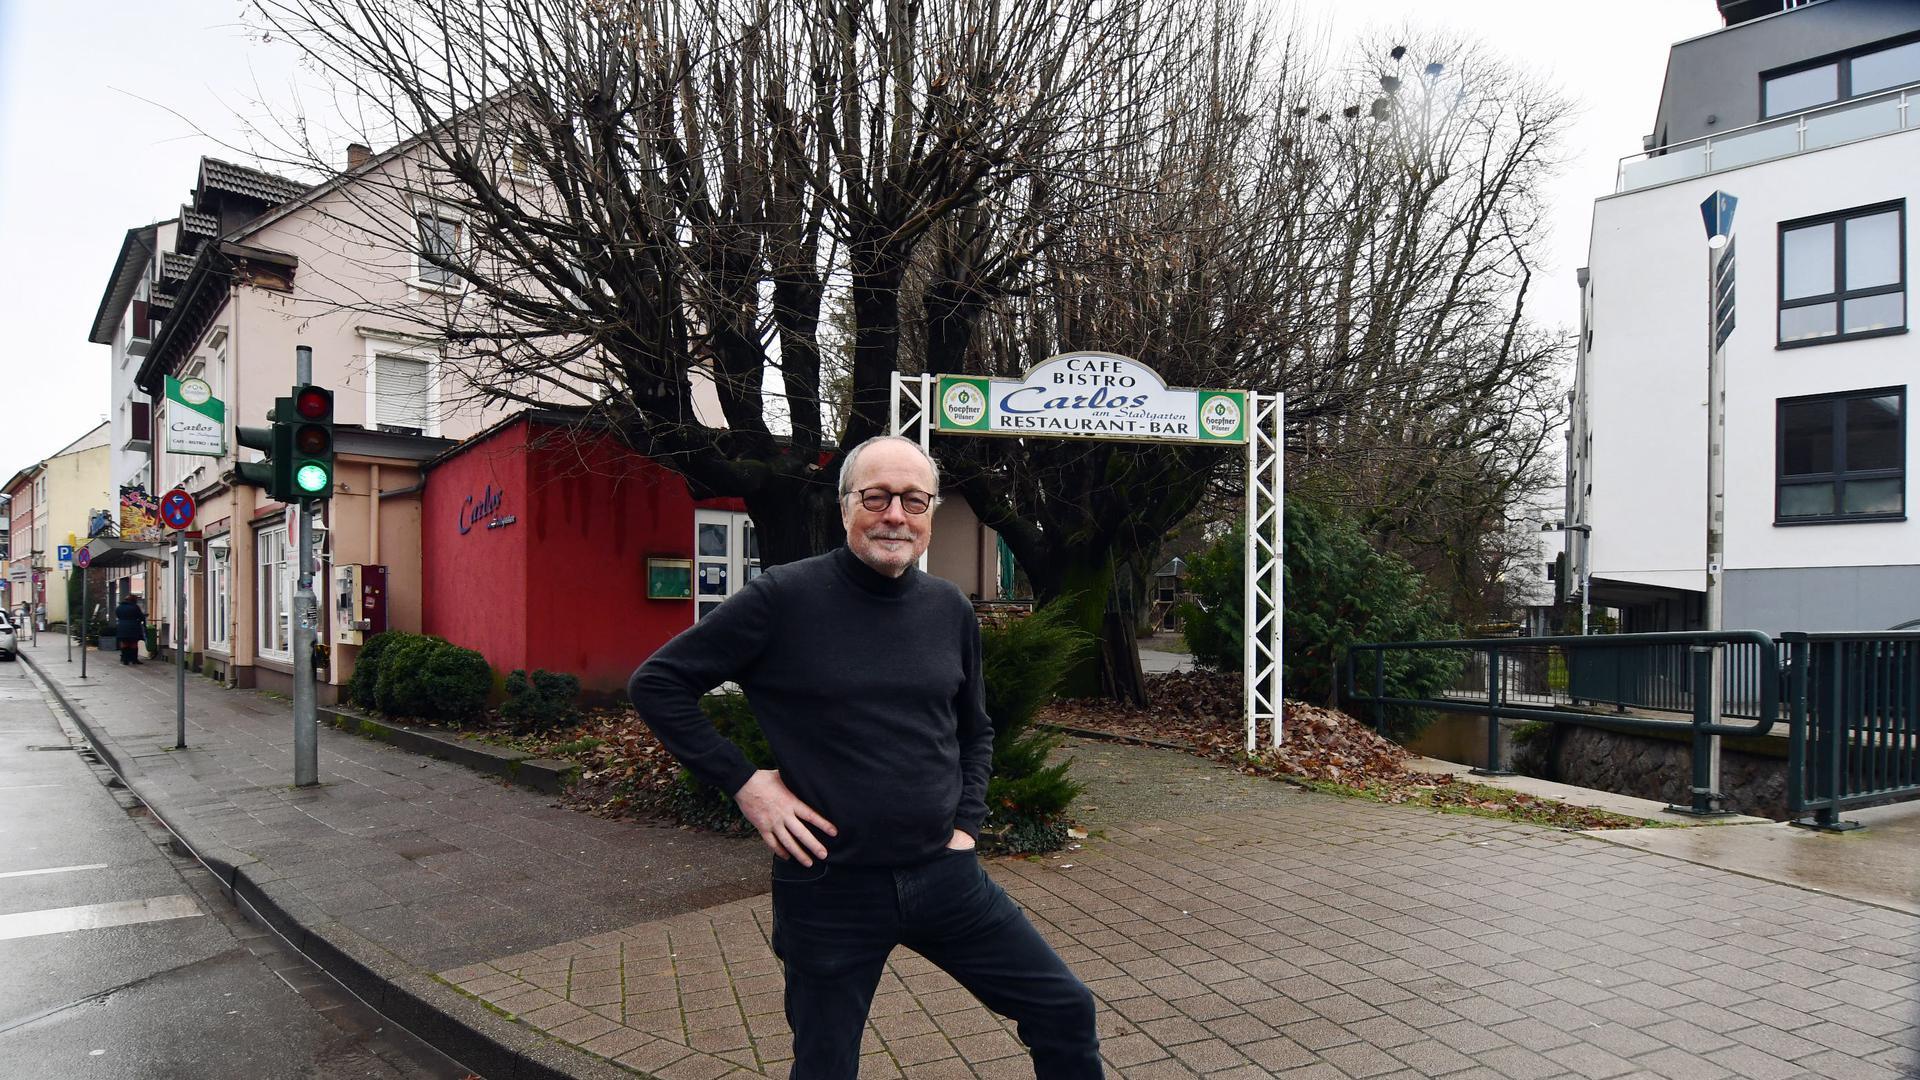 Carlos Caf-Bistro am Stadtgarten